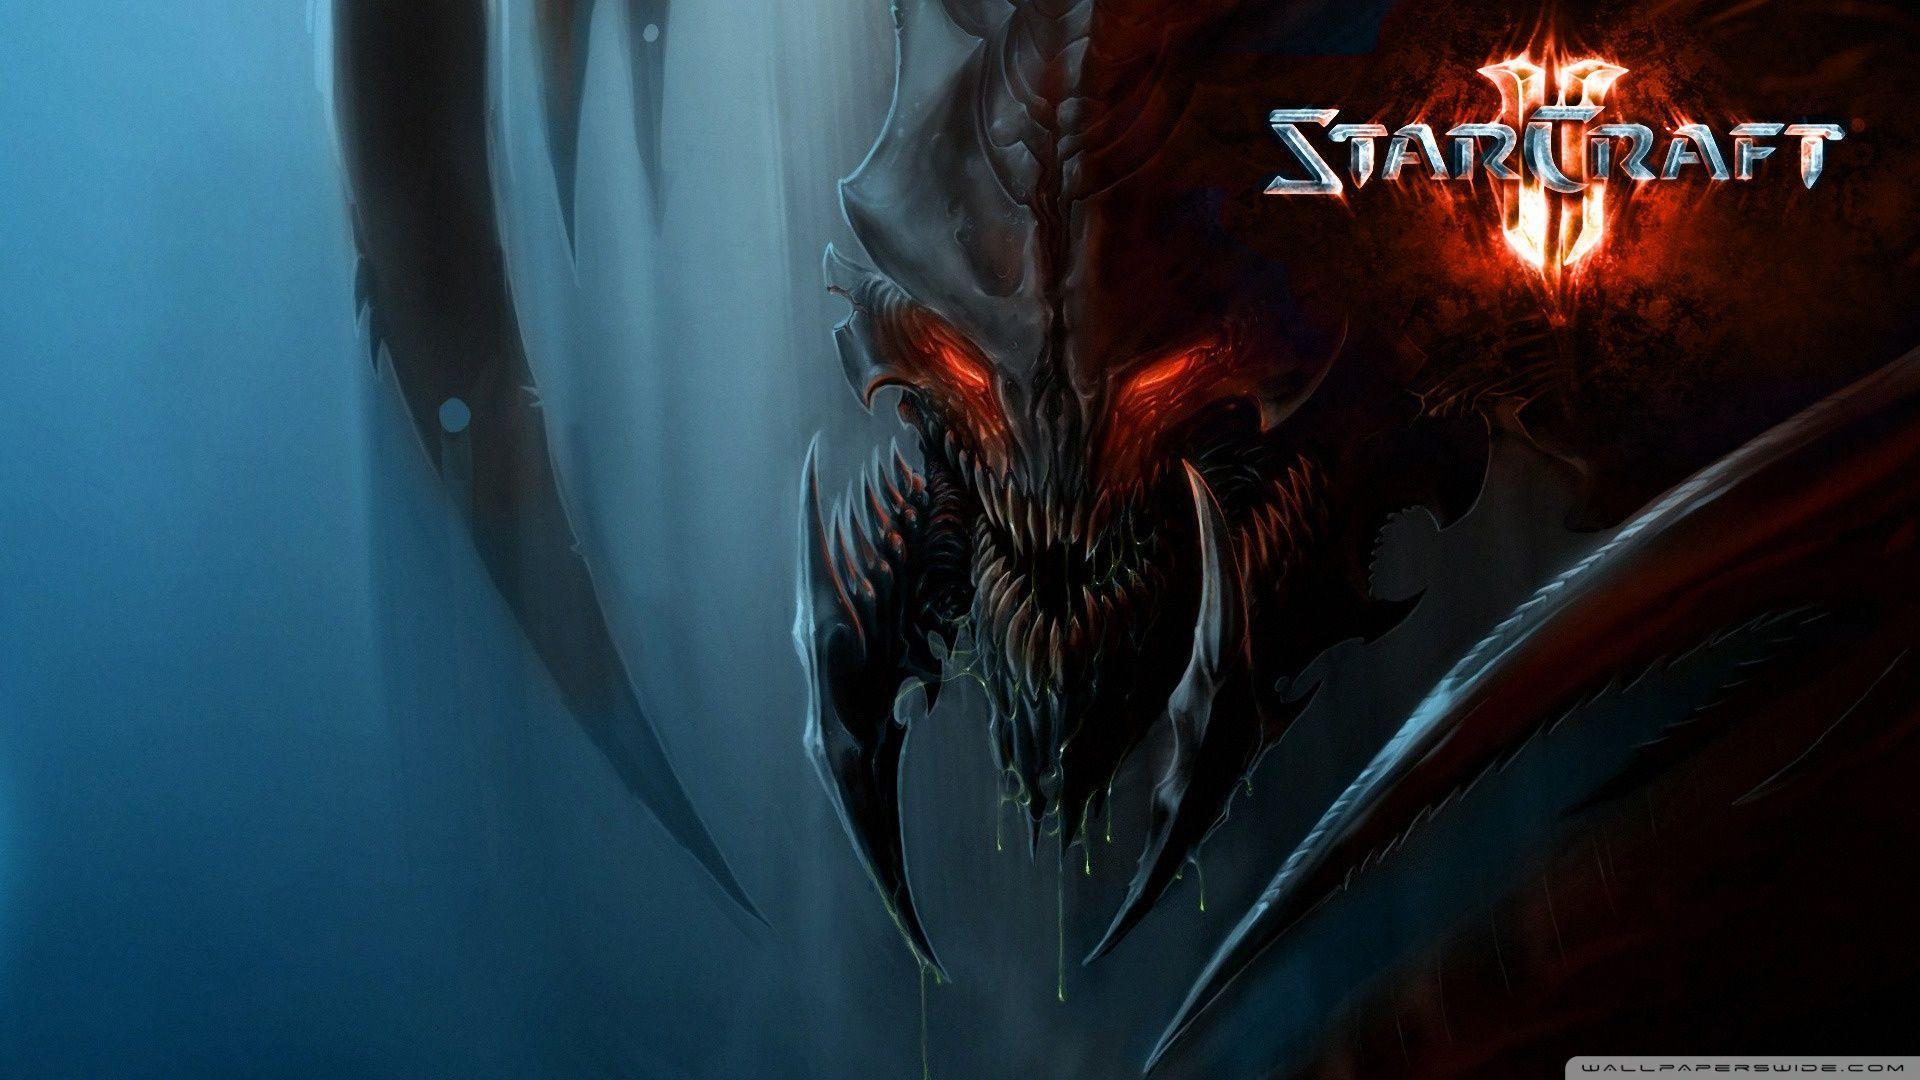 Starcraft 2 Zerg Wallpapers HD - Wallpaper Cave